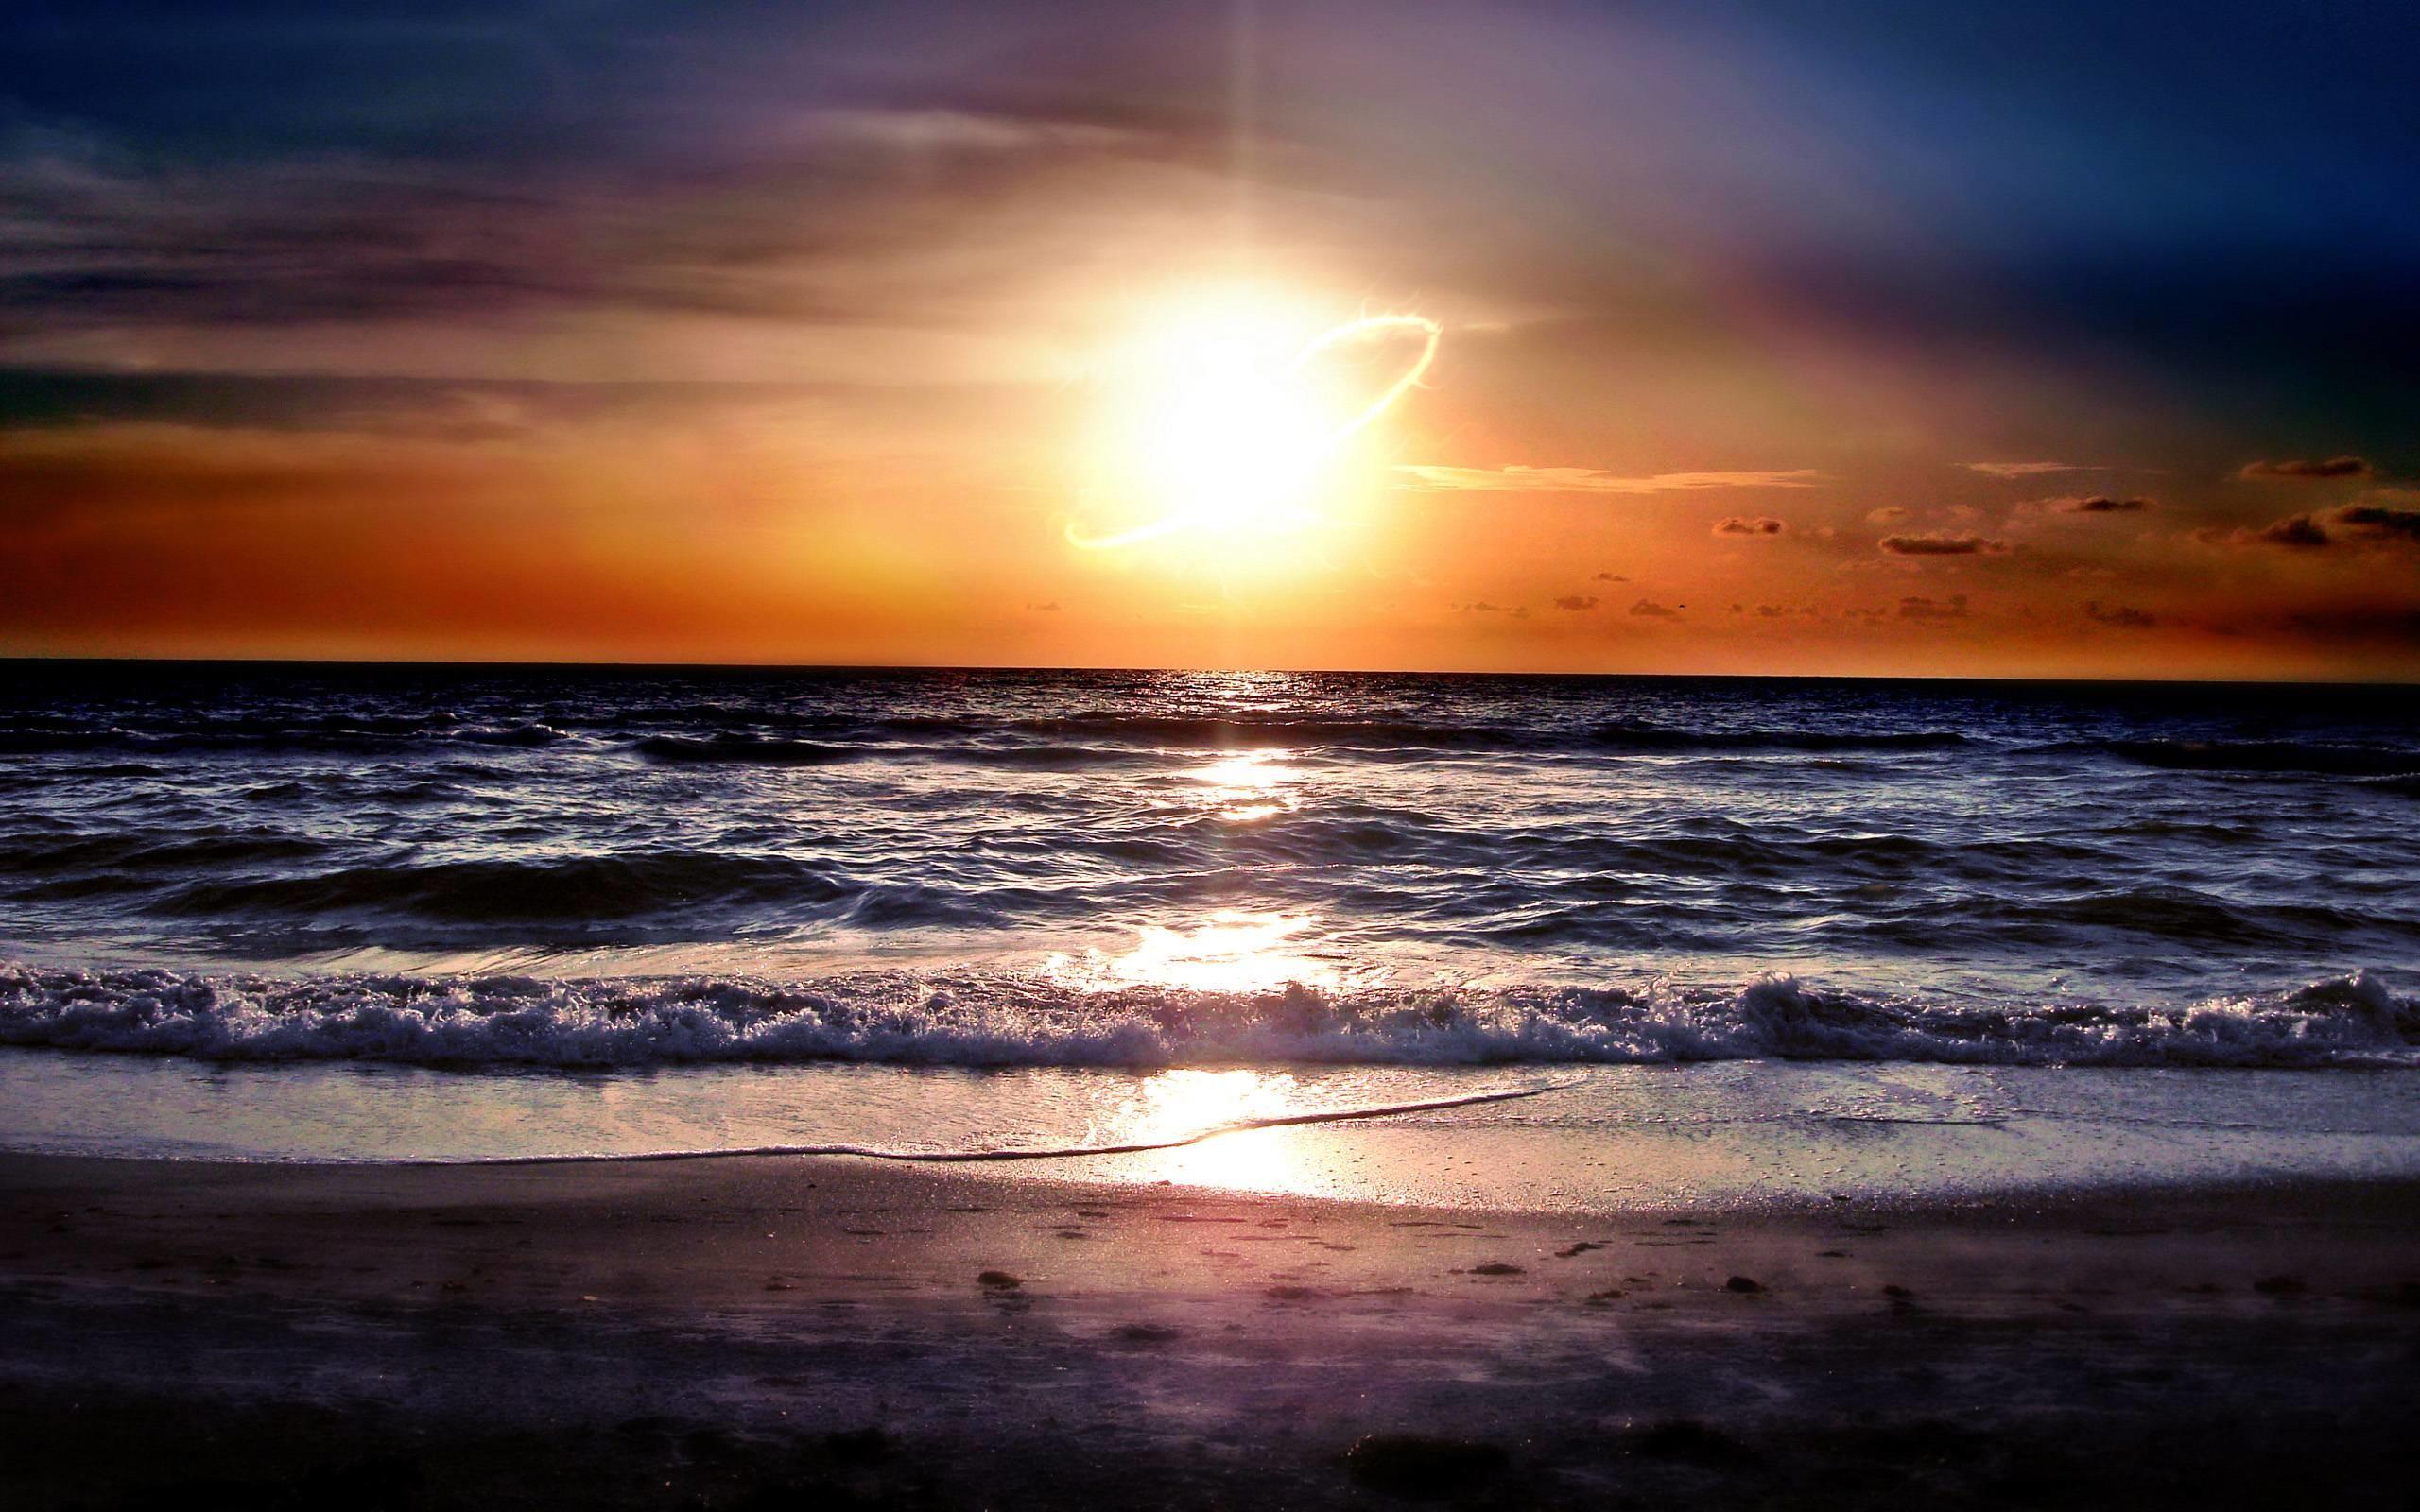 sunset screensavers and wallpaper